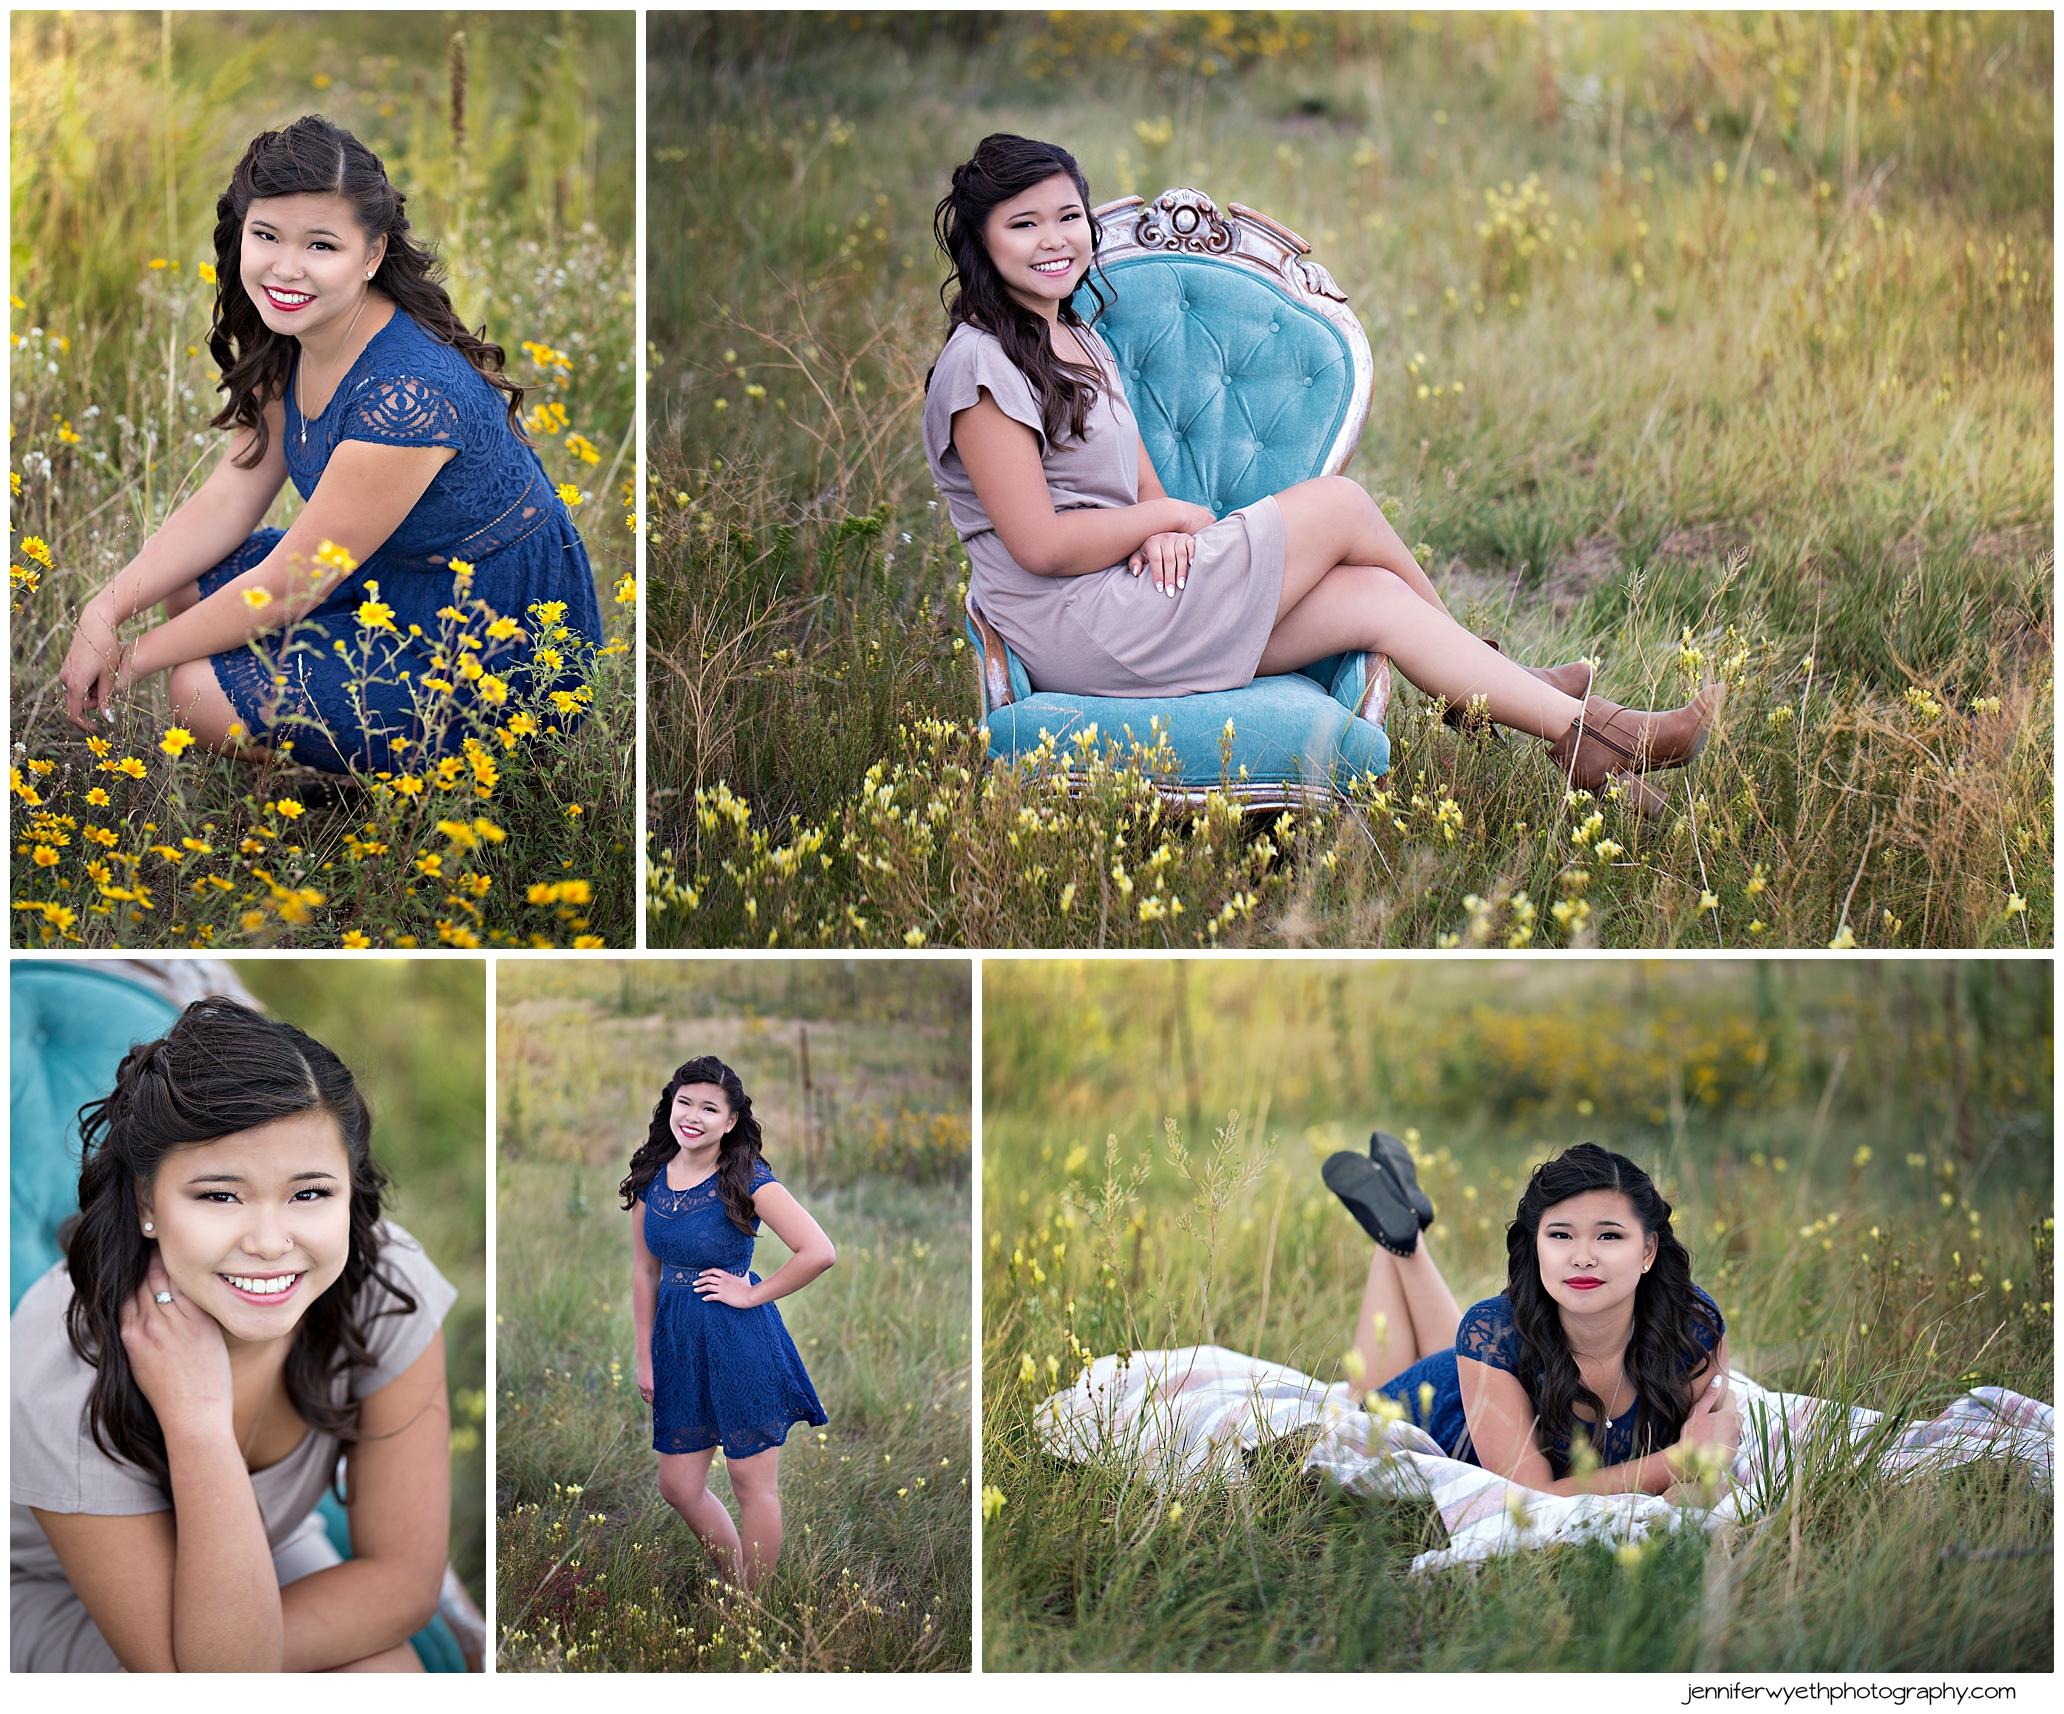 Jennifer-Wyeth-photography-senior-pictures-colorado-springs-photographer_0205.jpg